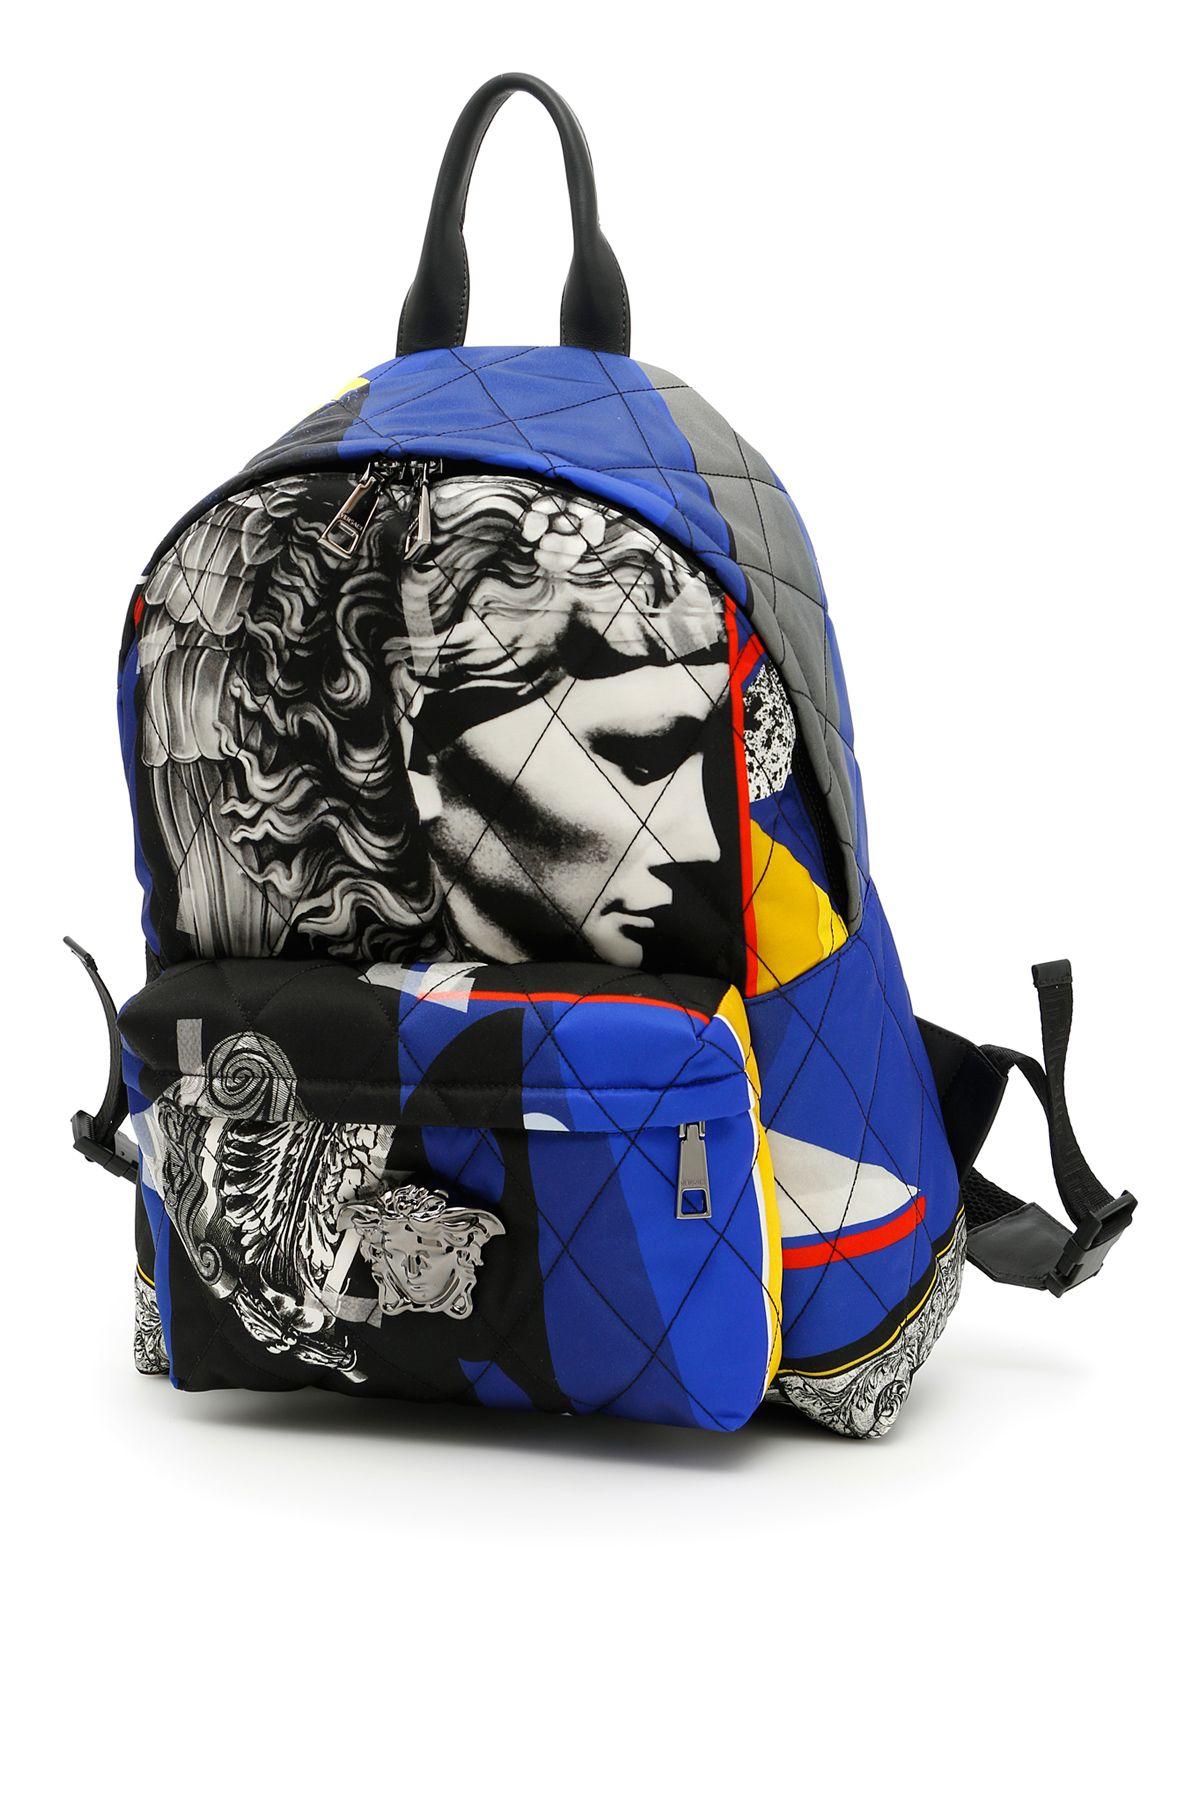 Jp Collage Backpack